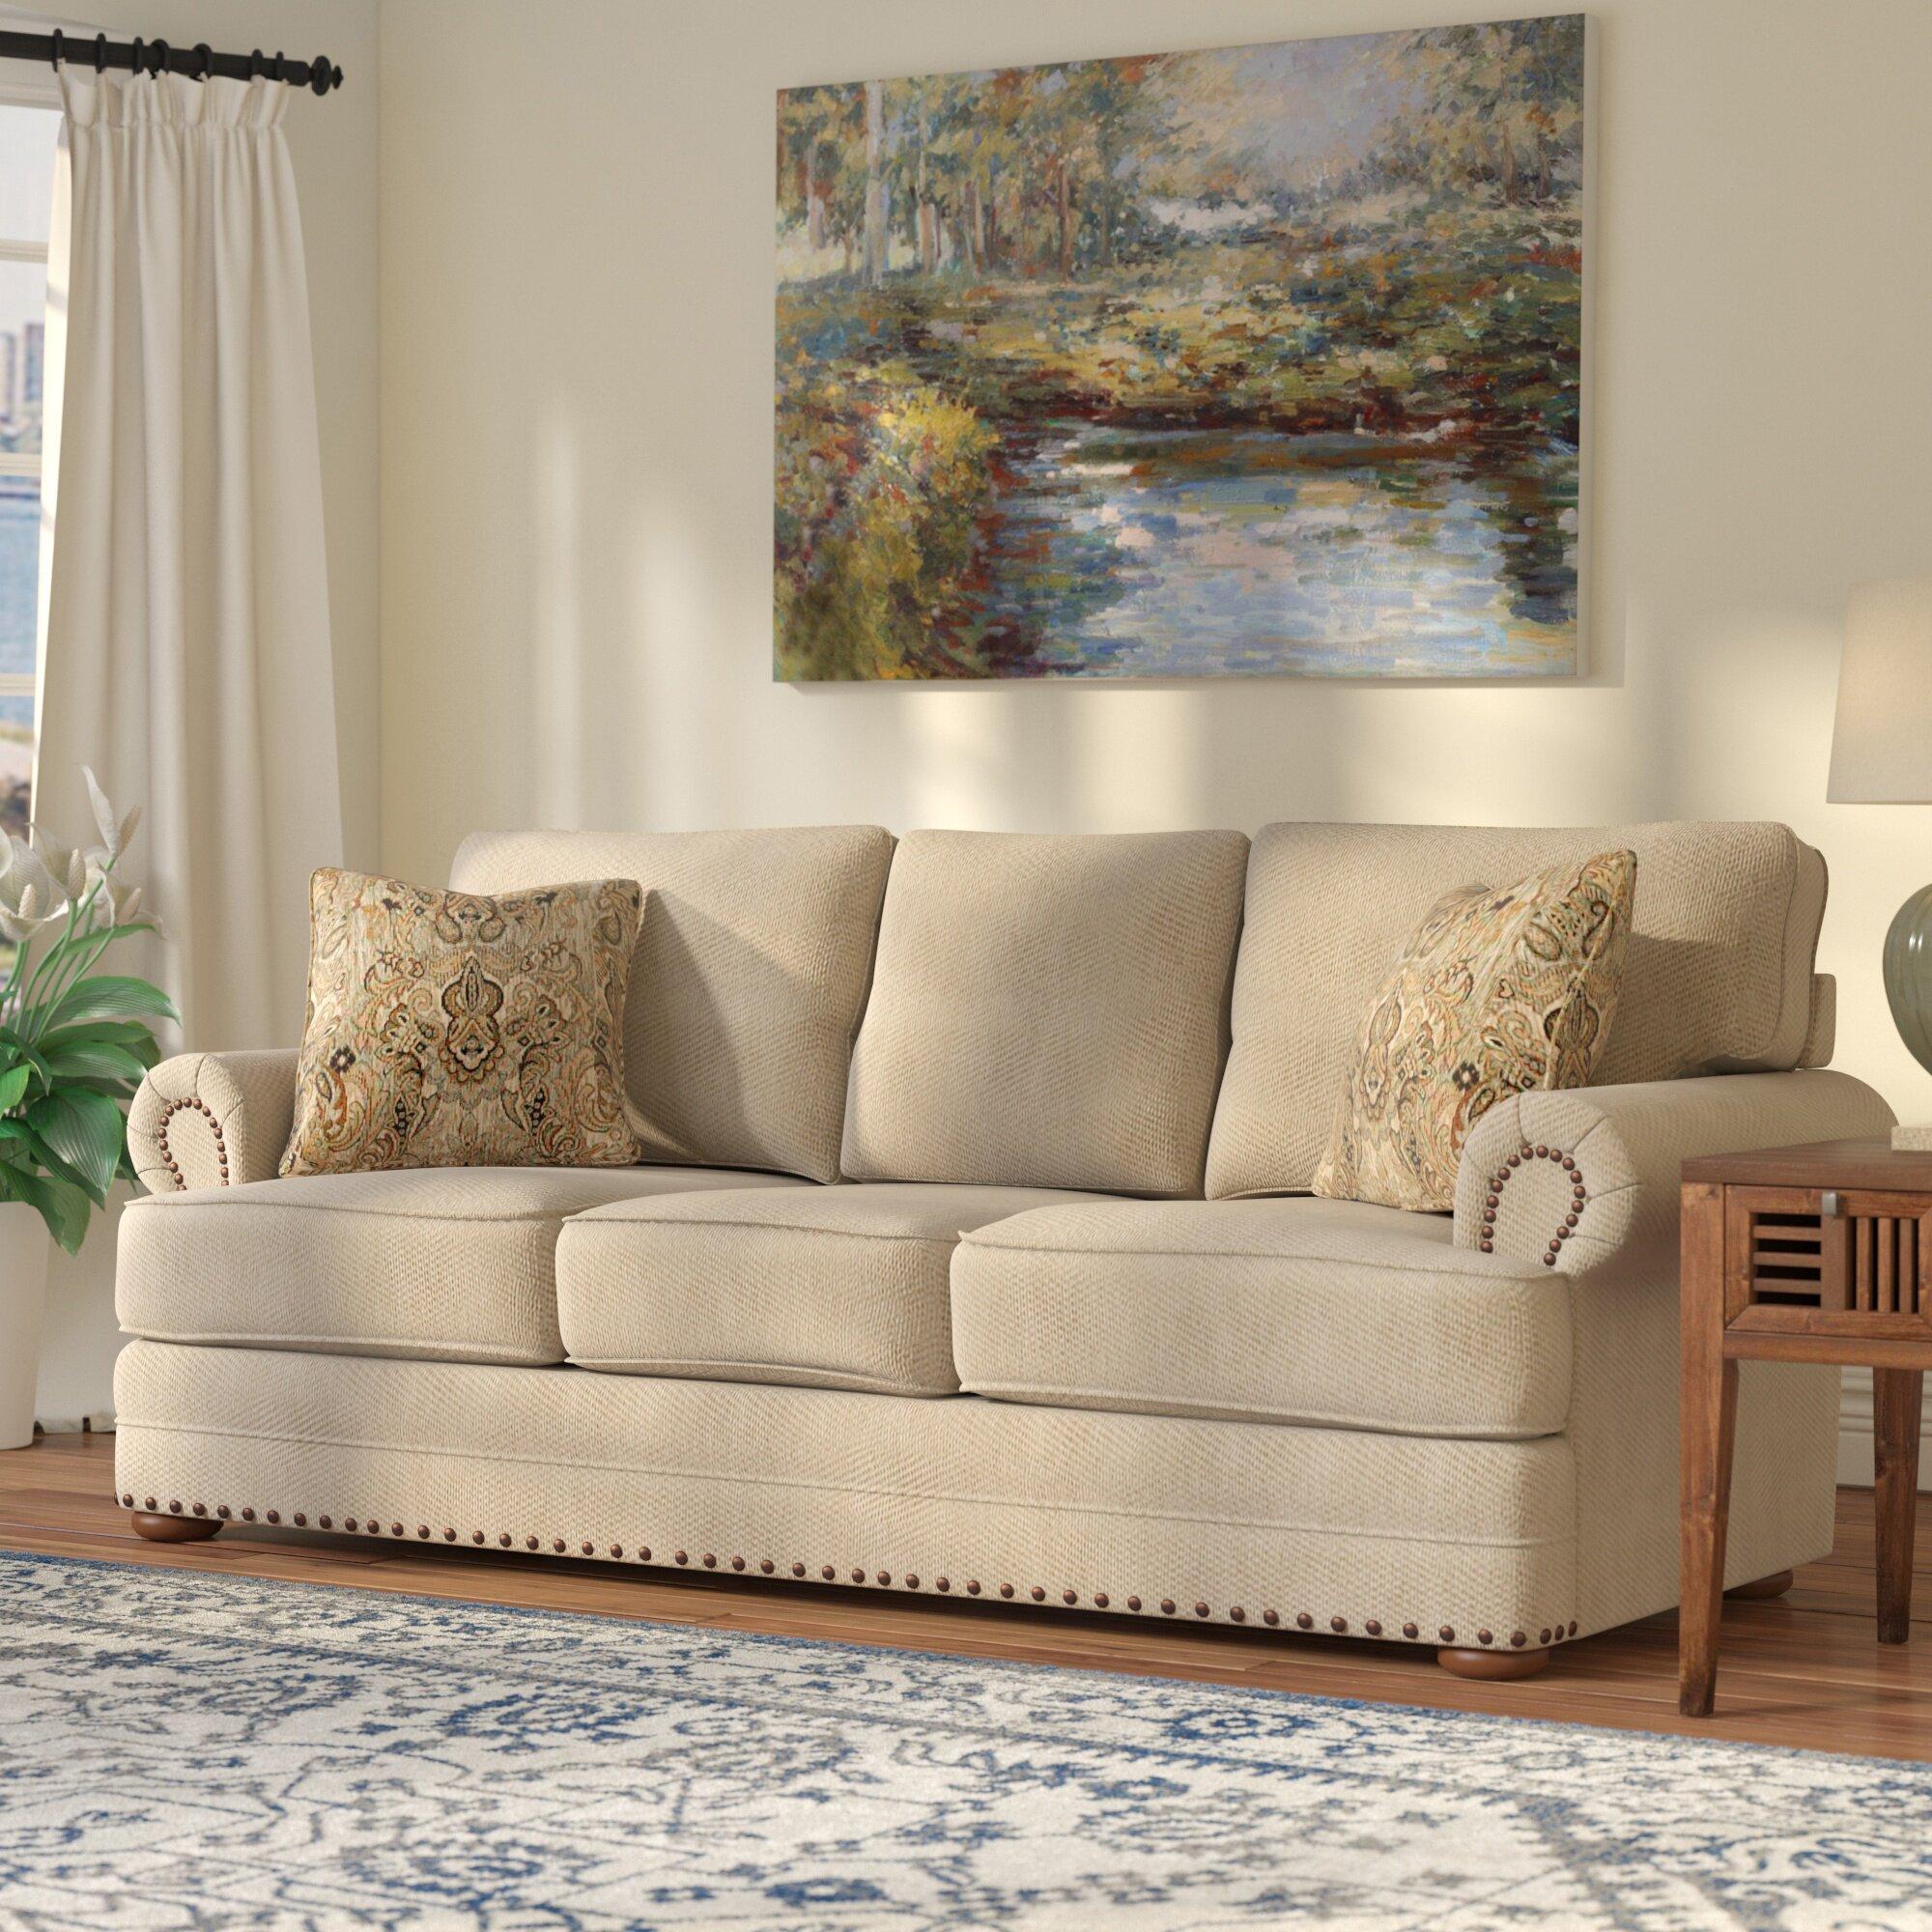 Laurel foundry modern farmhouse bernard sofa reviews - Laurel foundry modern farmhouse bedroom ...